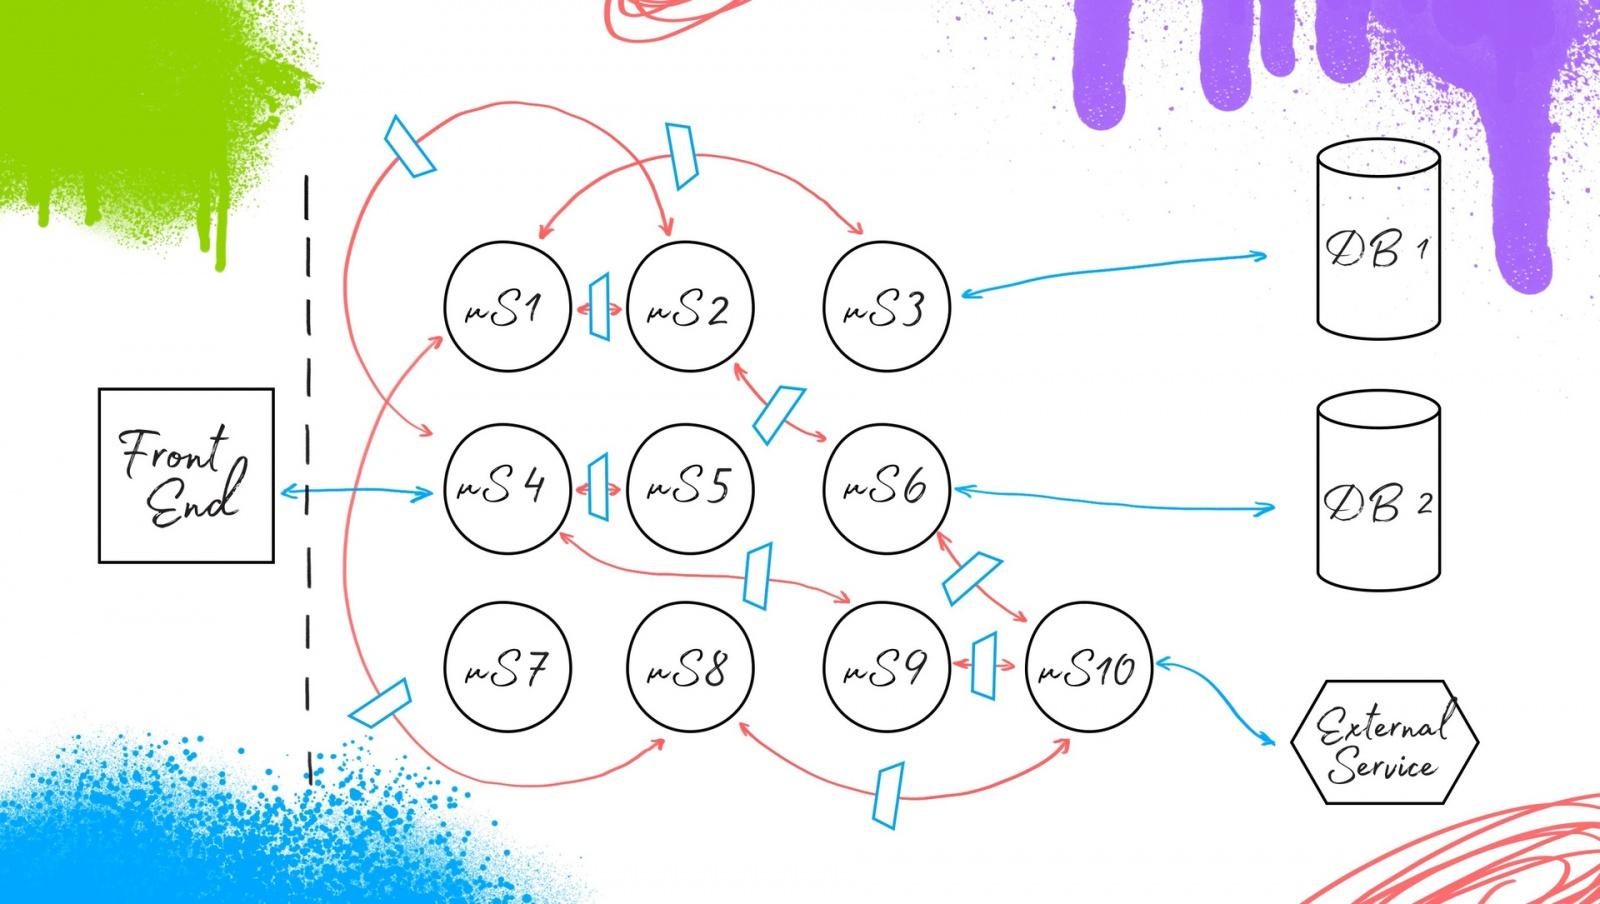 Ядро автоматизации тестирования в микросервисной архитектуре - 7